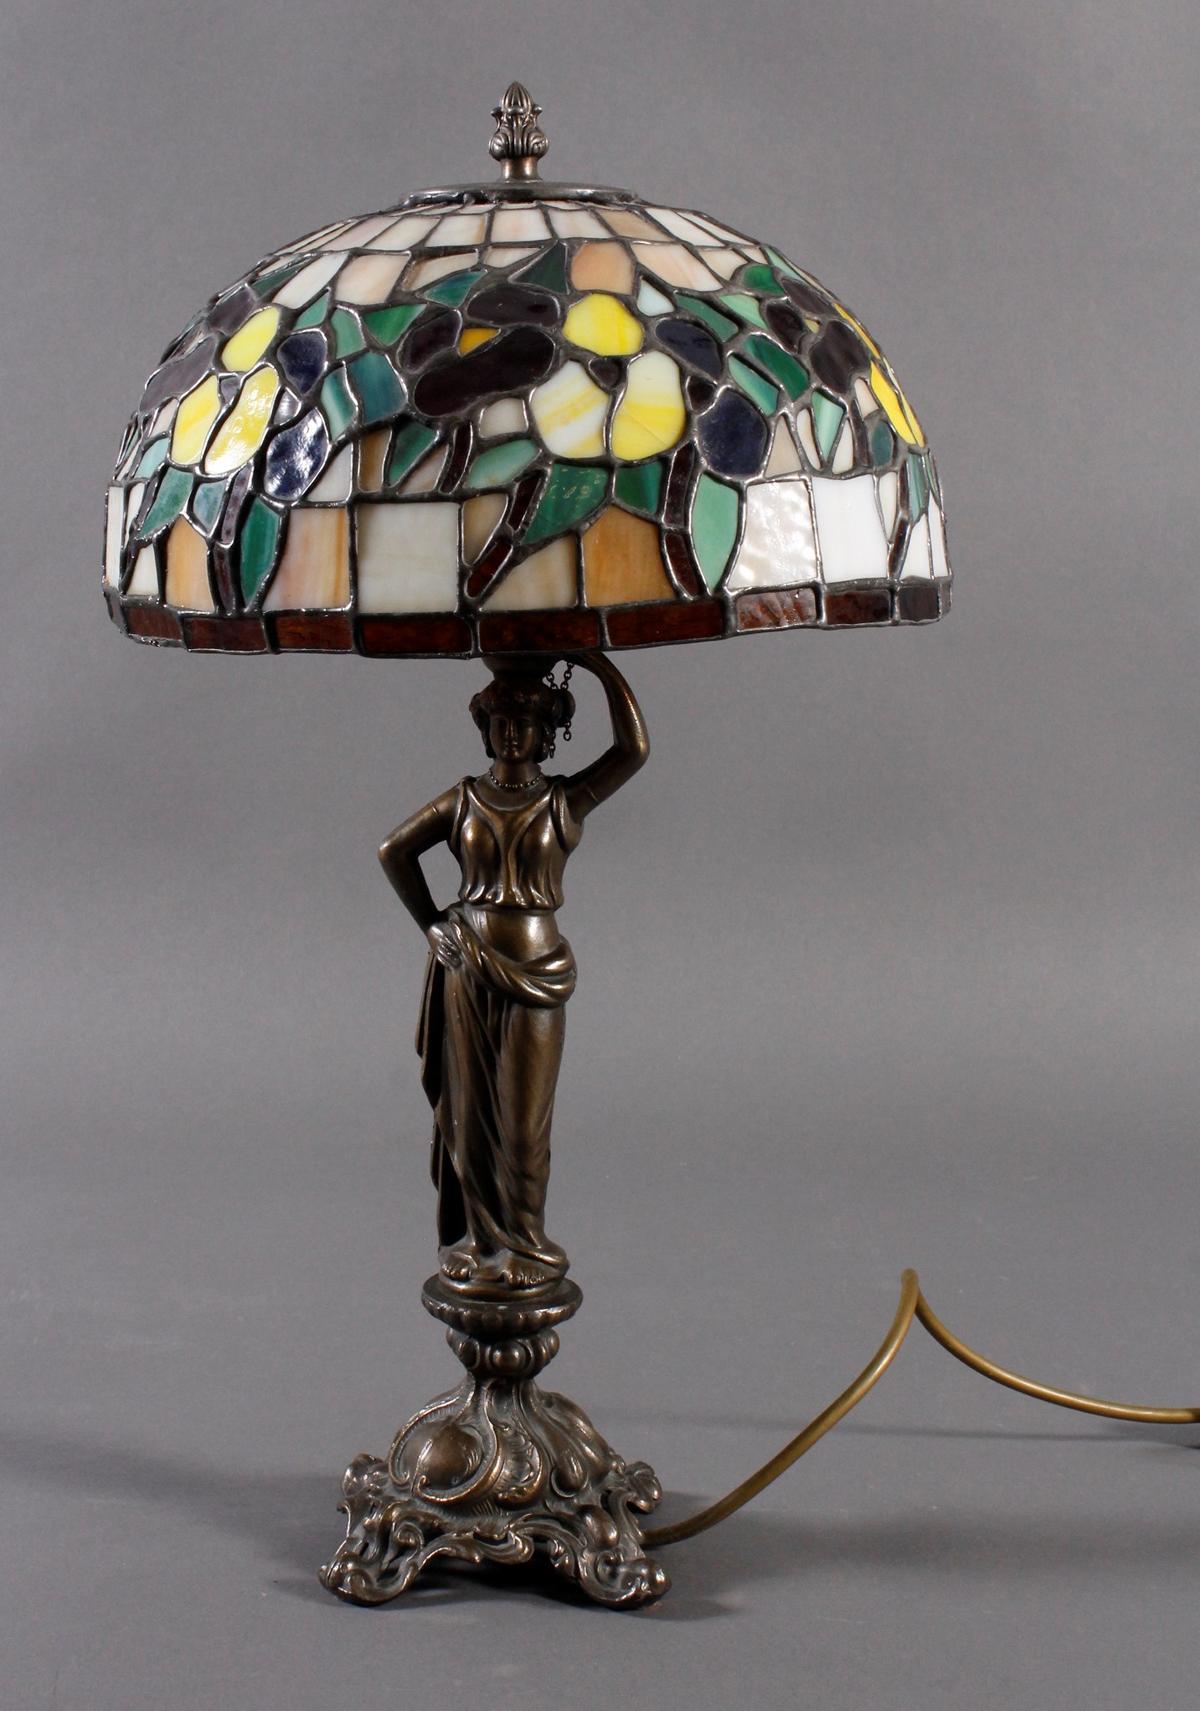 Tischlampe im Tiffany-Stil, 2. Hälfte 20. Jh.